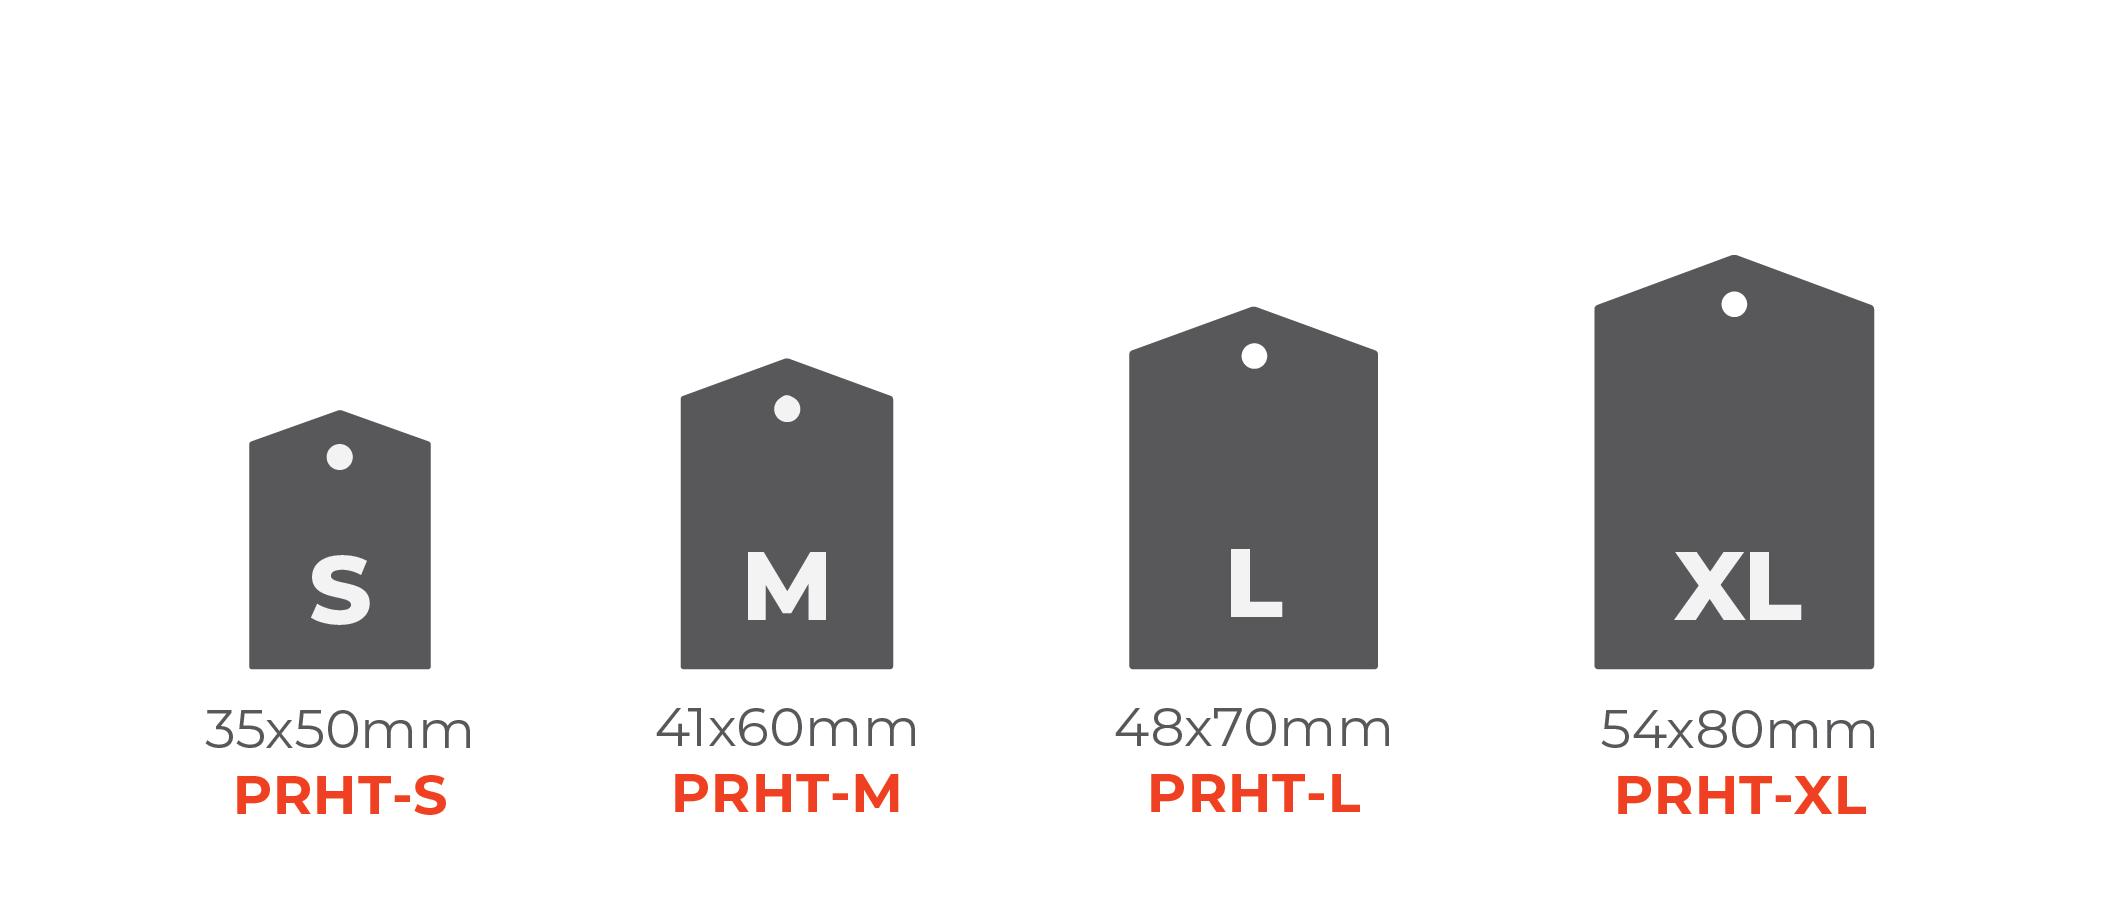 Standard Hang Tags - Price Tags 0x0mm 01 Image